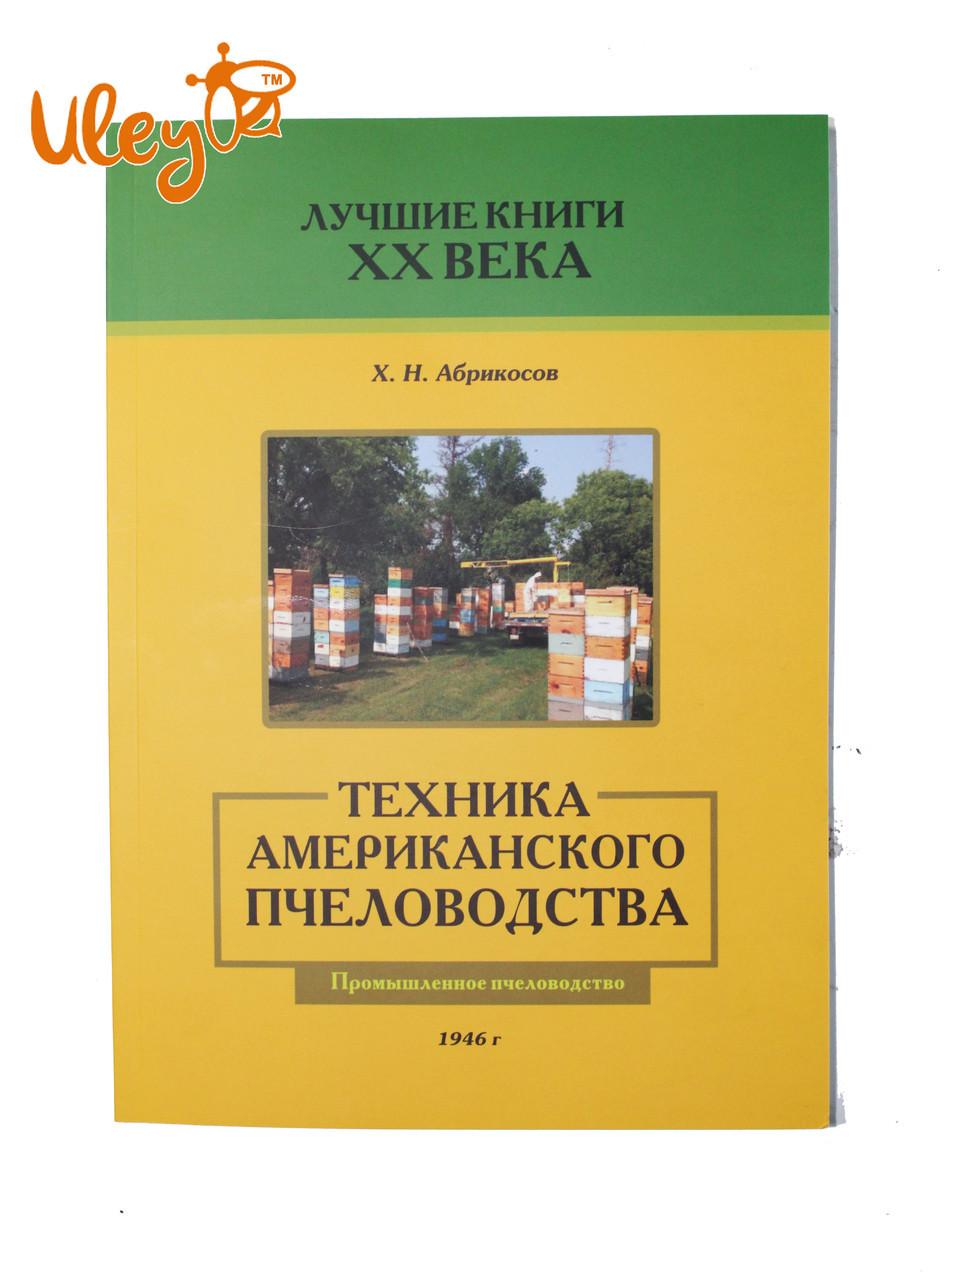 Книга «Техника американского пчеловодства» Абрикосов Х.Н.